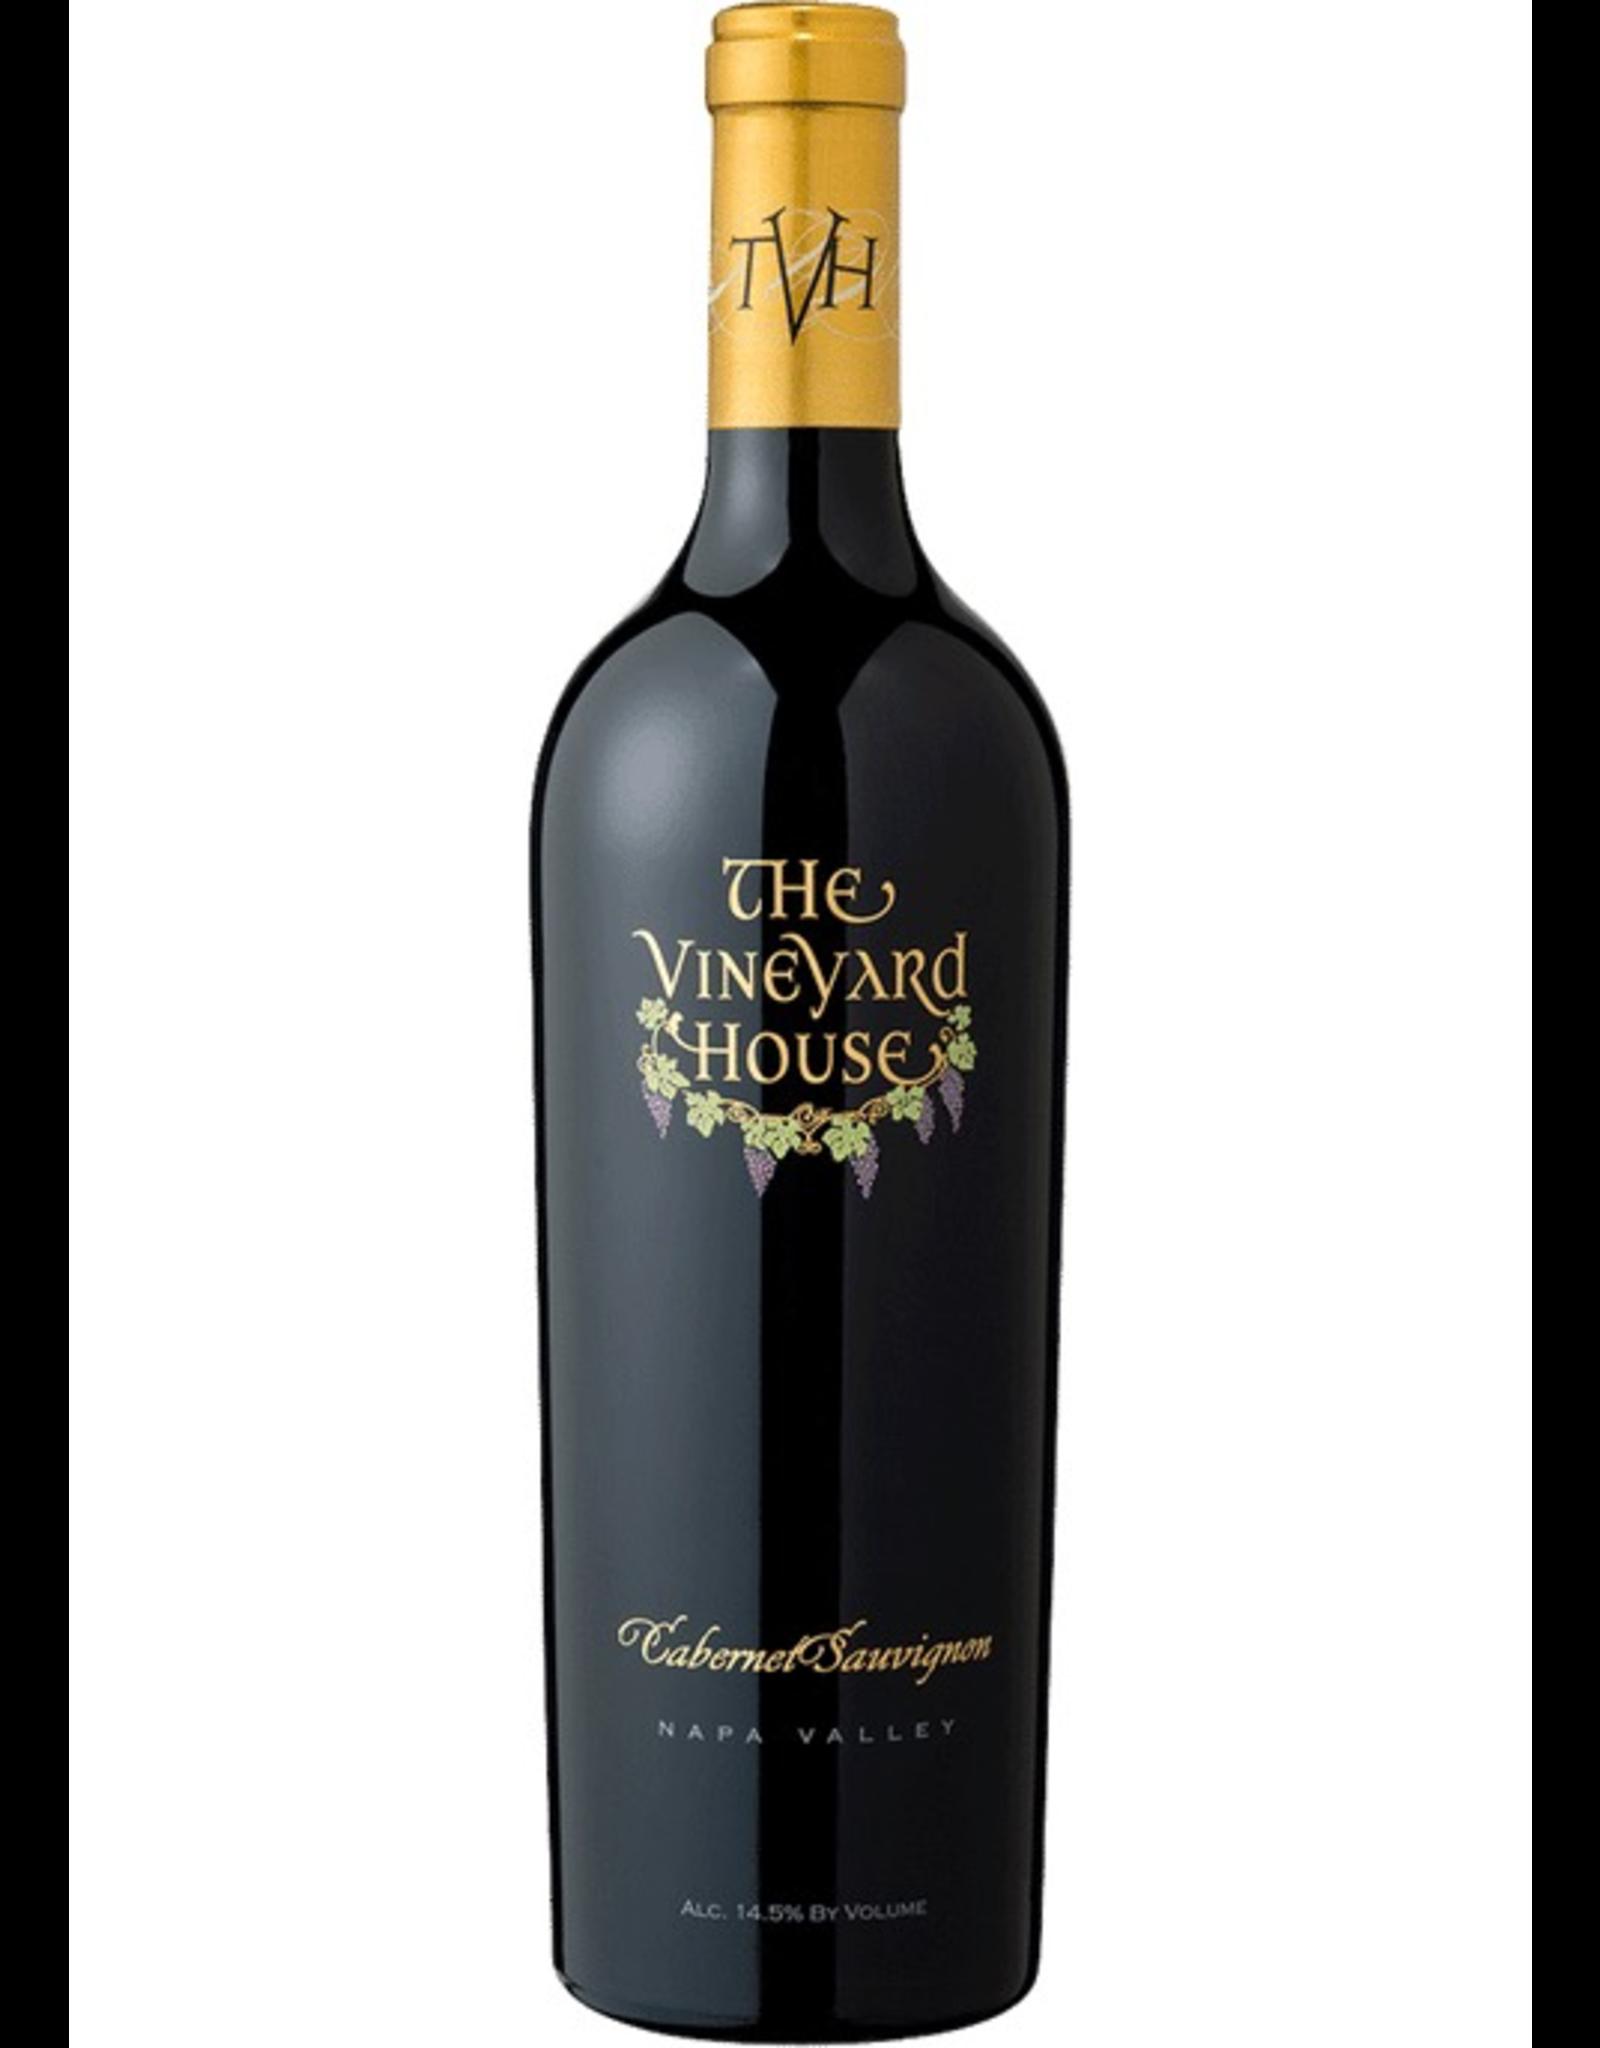 Red Wine 2016, TVH The Vineyard House by Jeremy Nickel Cellars HW Grabbs Hermosa (Estate) Vineyard, Cabernet Sauvignon, Oakville, Napa Valley, California, 14.5% Alc, CTnr